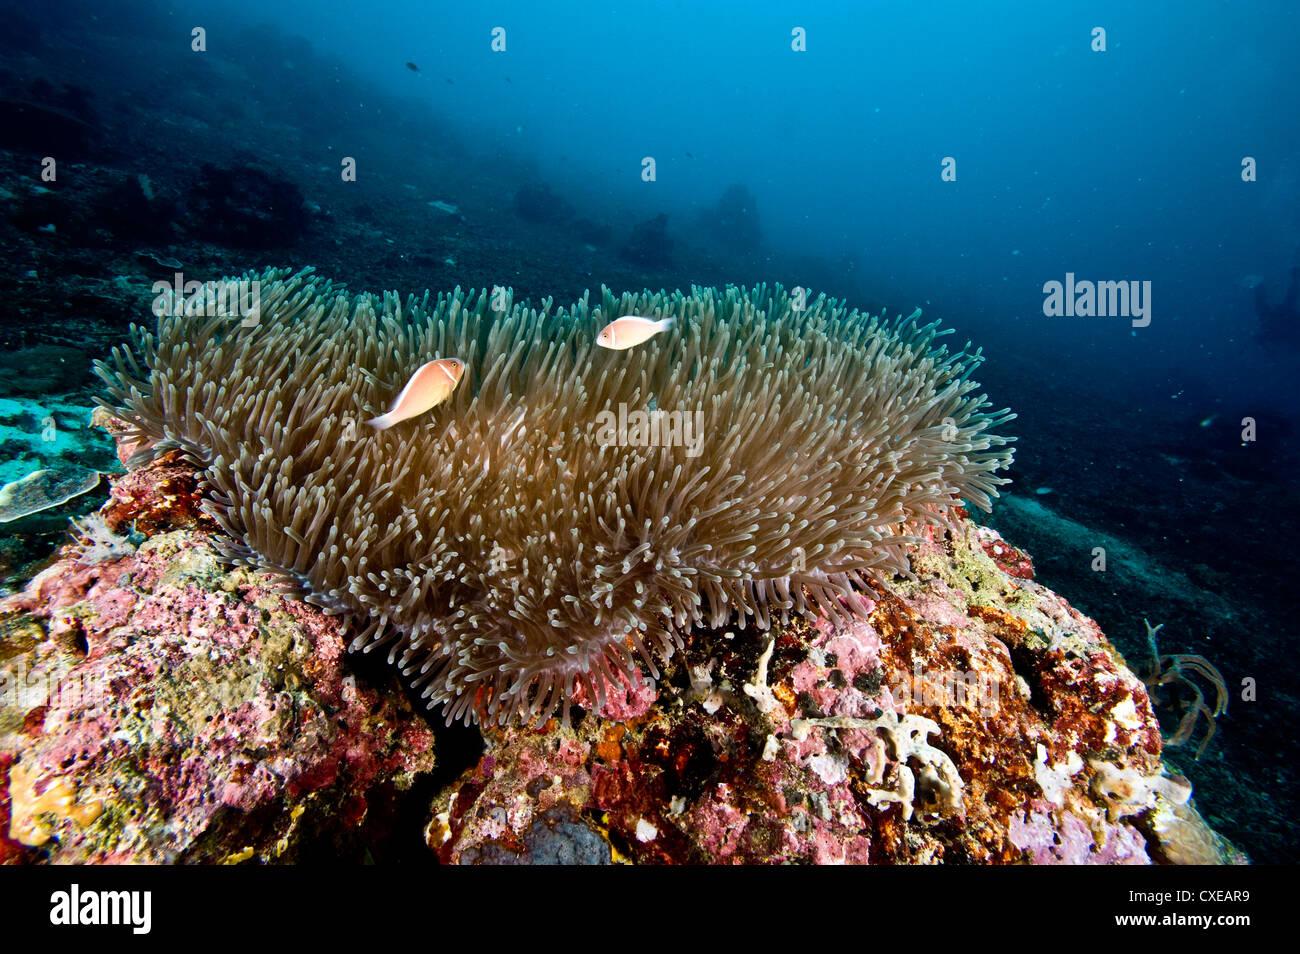 Anemone reef scene at Nalusuan Marine Sanctuary, Cebu, Philippines, Southeast Asia, Asia Stock Photo